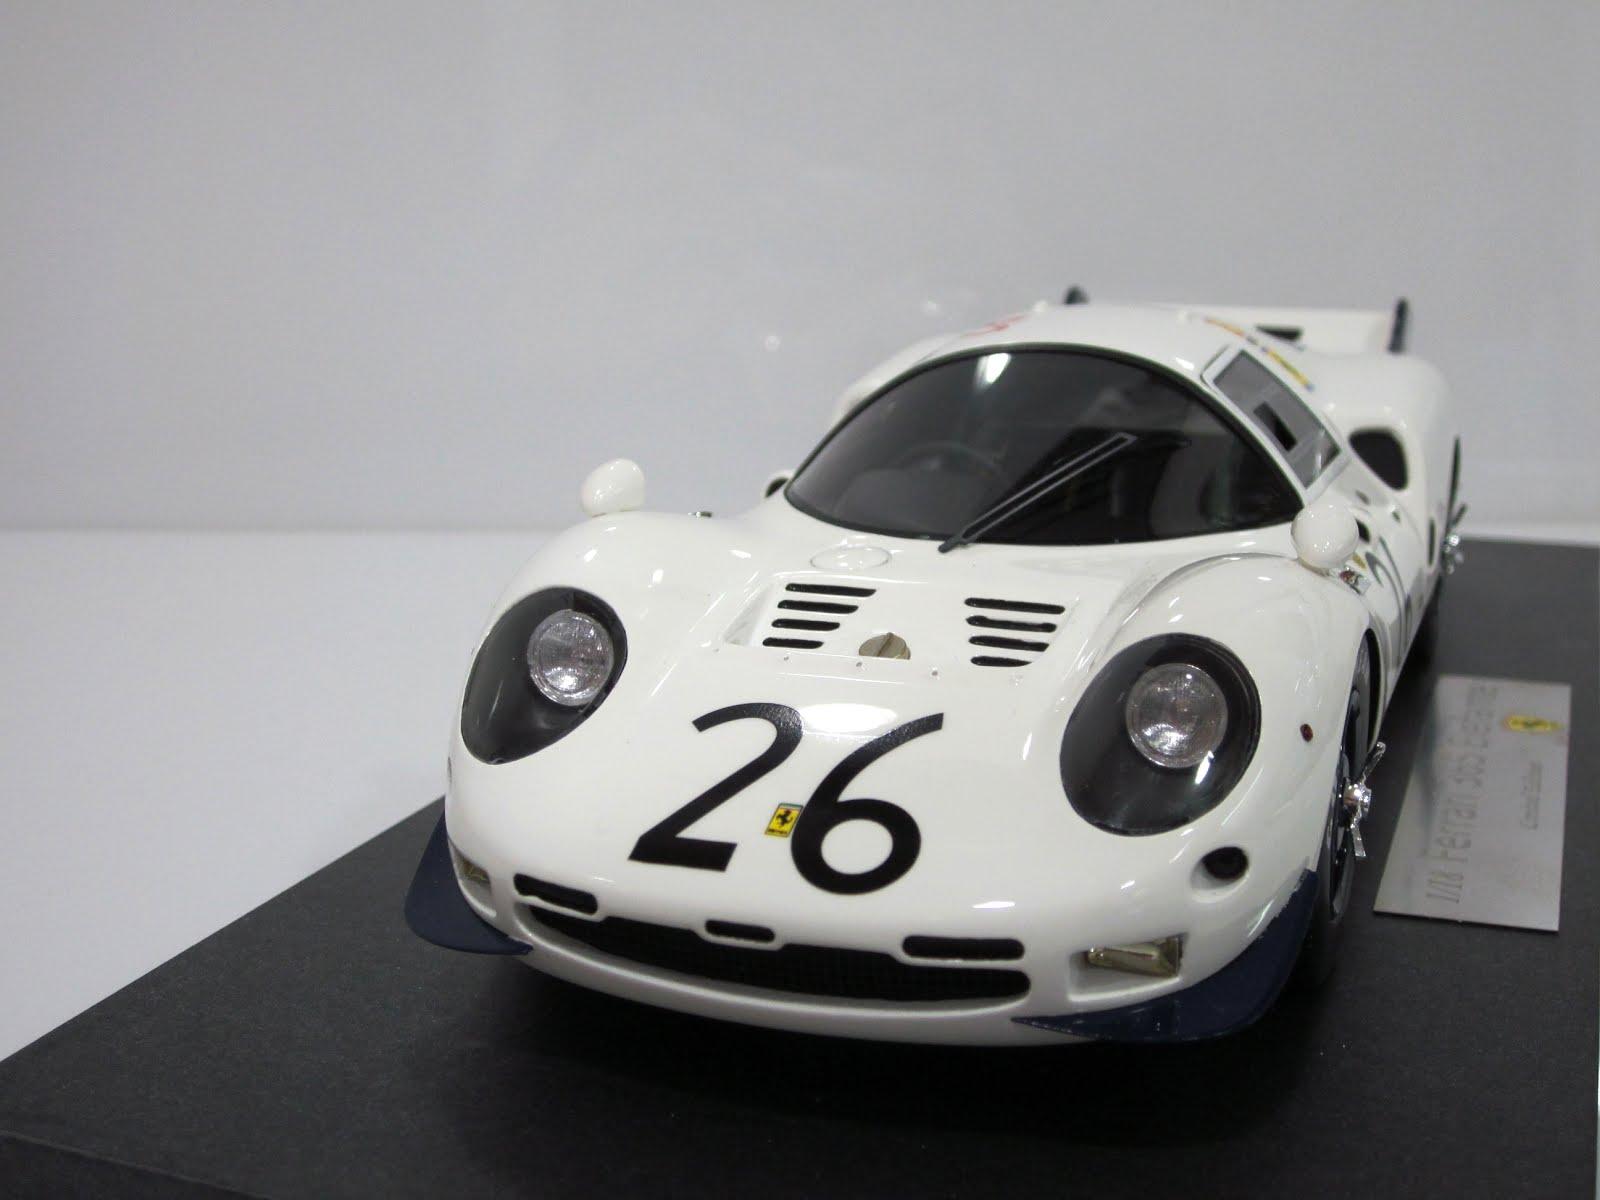 Ferrari 365 P2 Elefante #26 - 24 Horas de Le Mans 1967 - CMF